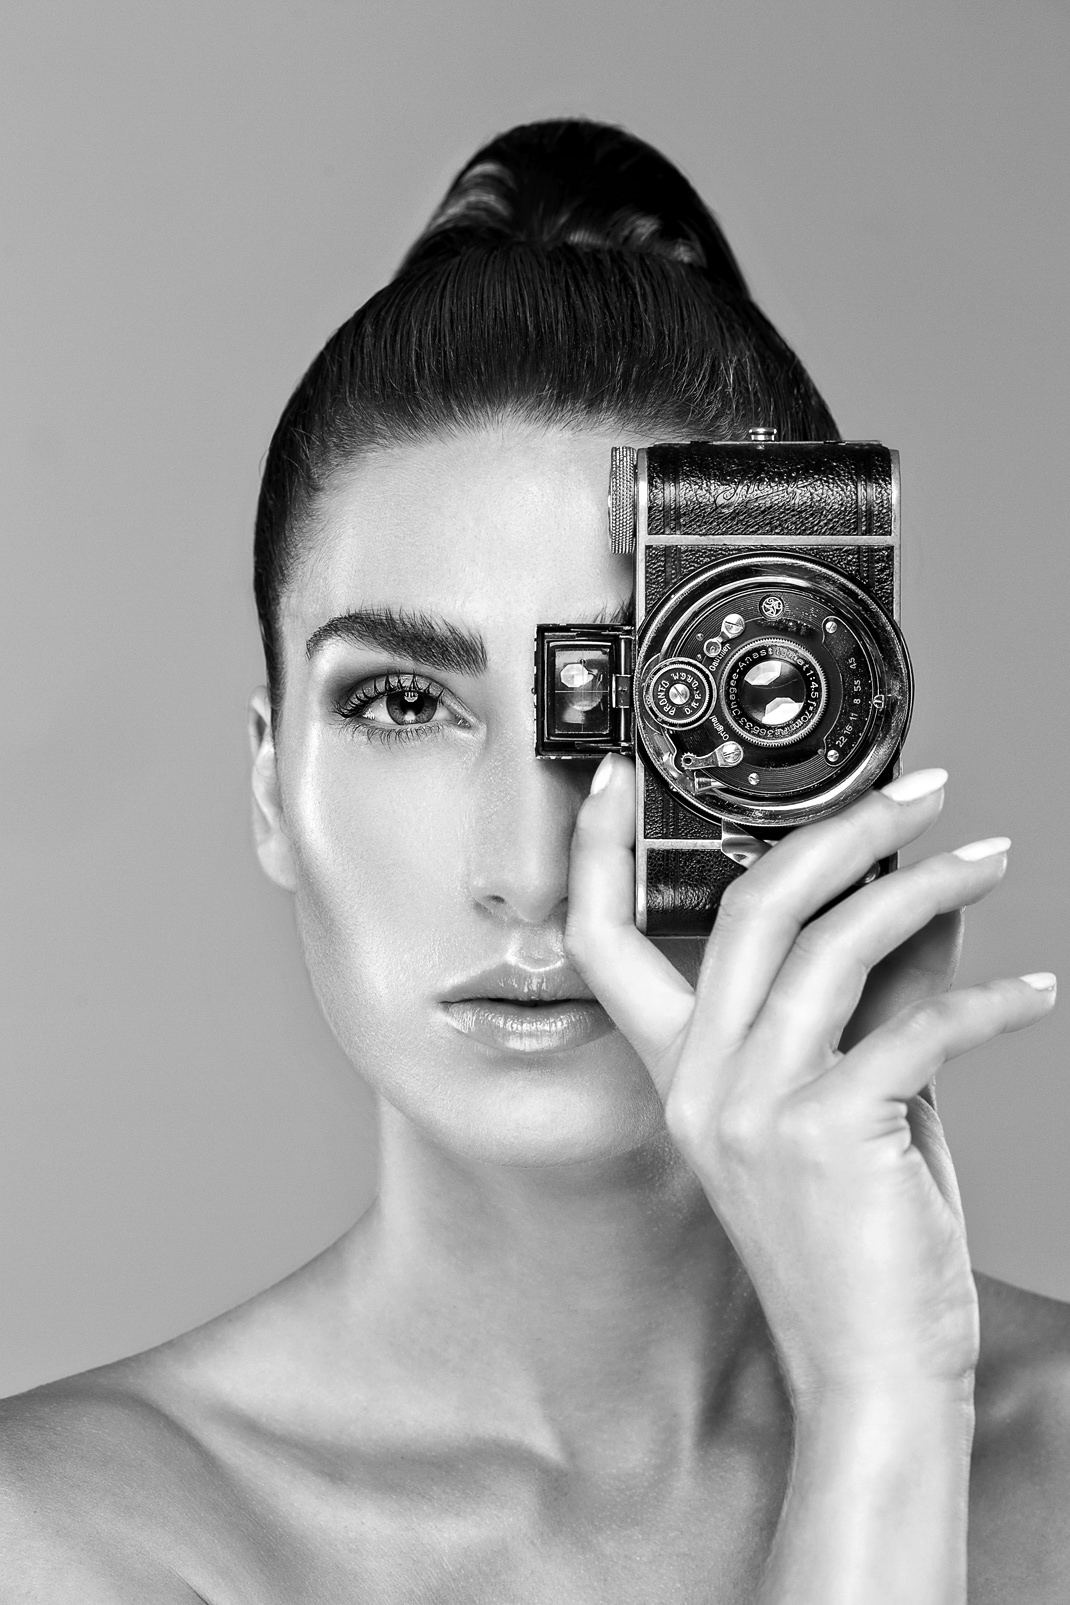 Two Beauties - Carolin & Ihagee Parvola - Markus Hertzsch - Camera - Girl